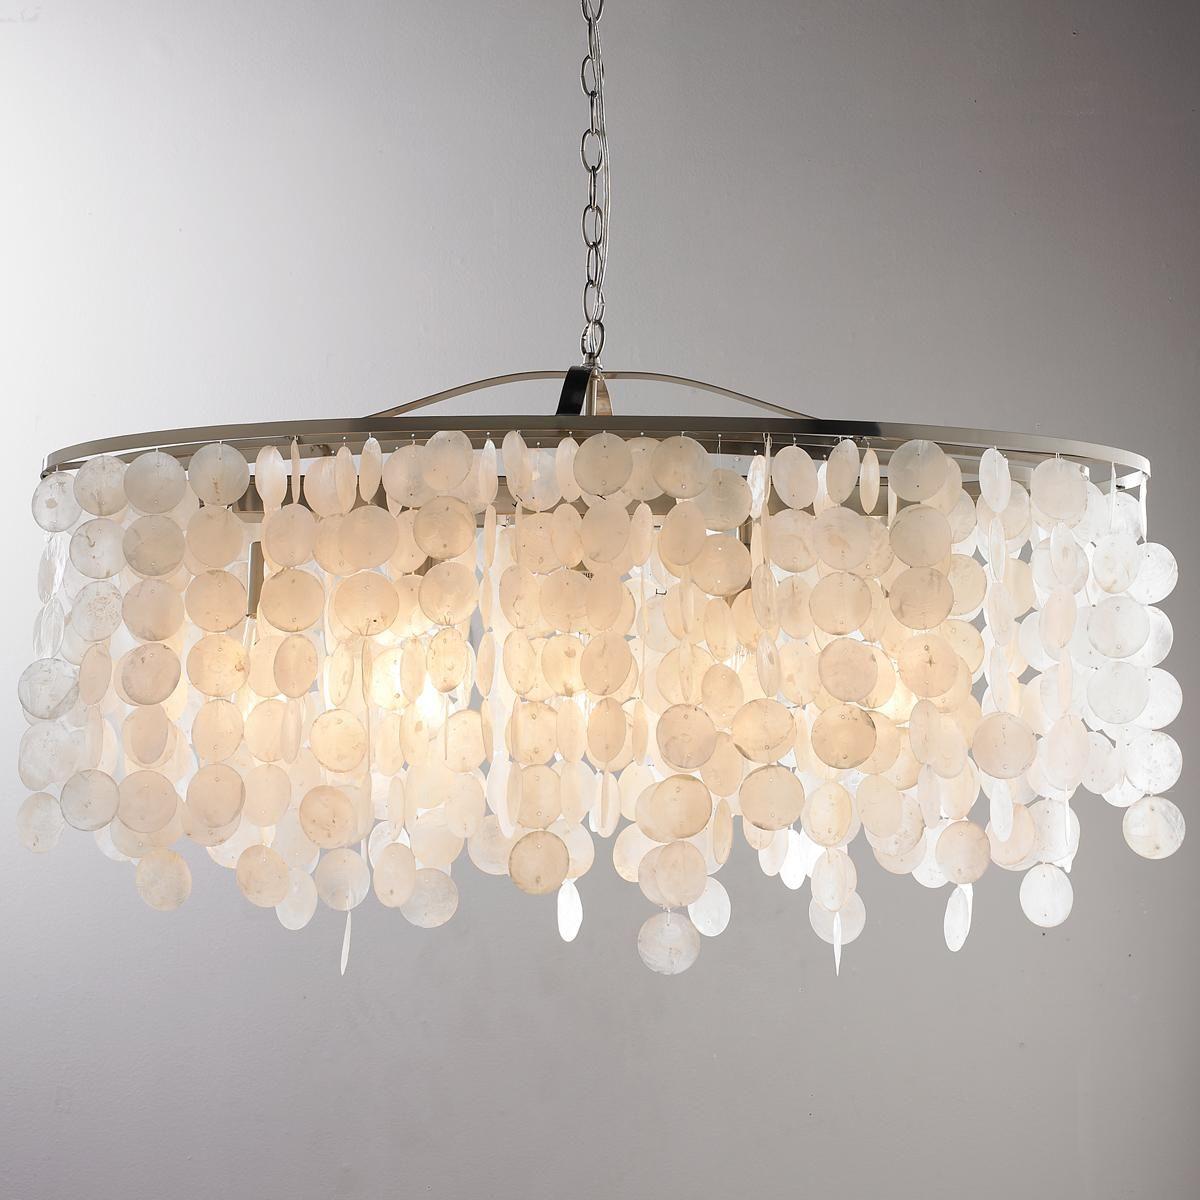 Modern capiz shell linear chandelier linear chandelier nickel modern capiz shell linear chandelier arubaitofo Gallery